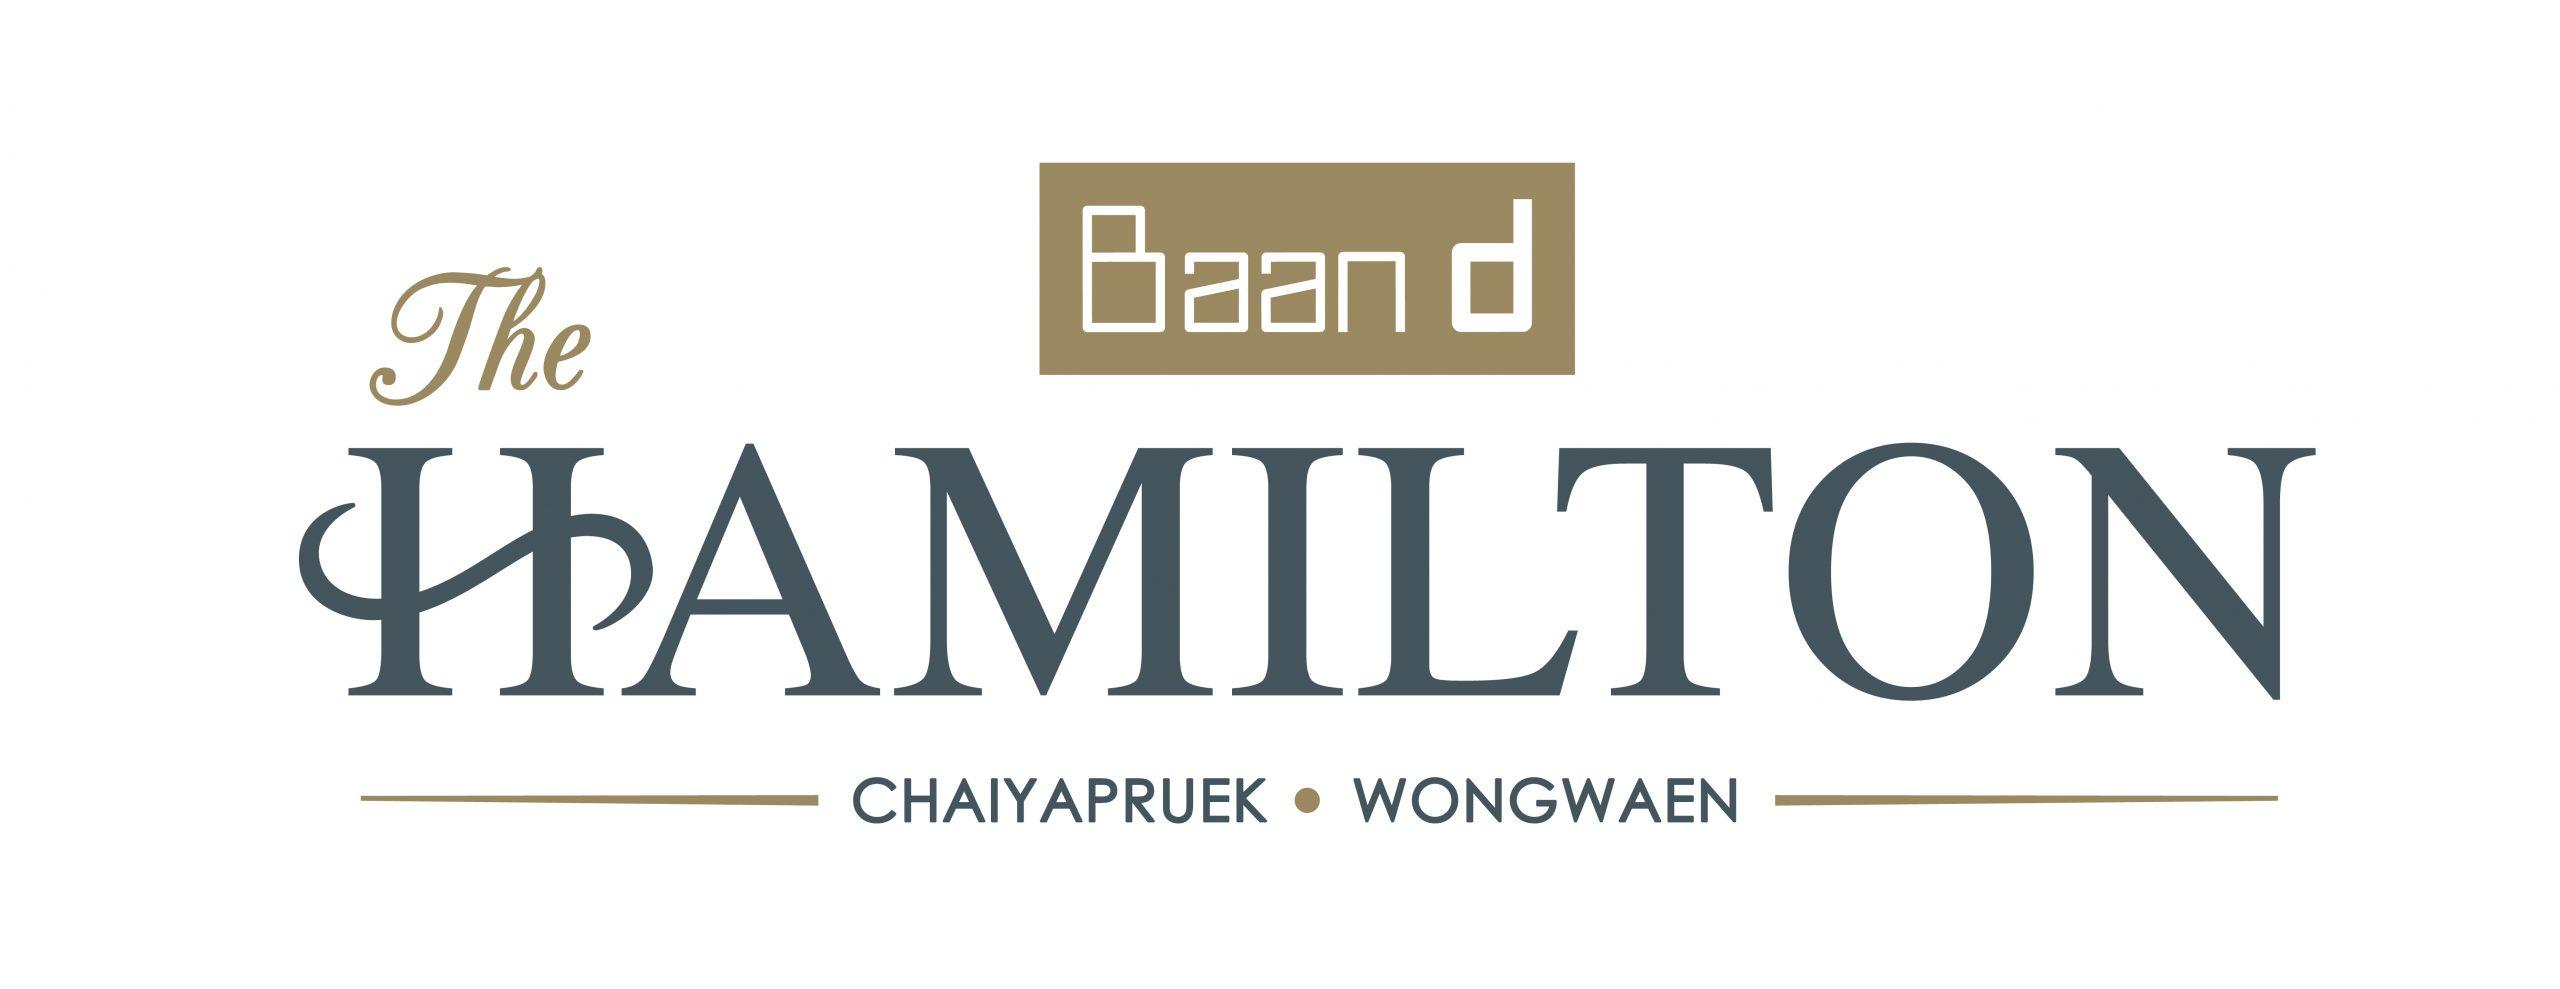 DLAN GROUP บริษัท ดี-แลนด์ กรุ๊ป จำกัด Logo Hamilton 03 scaled